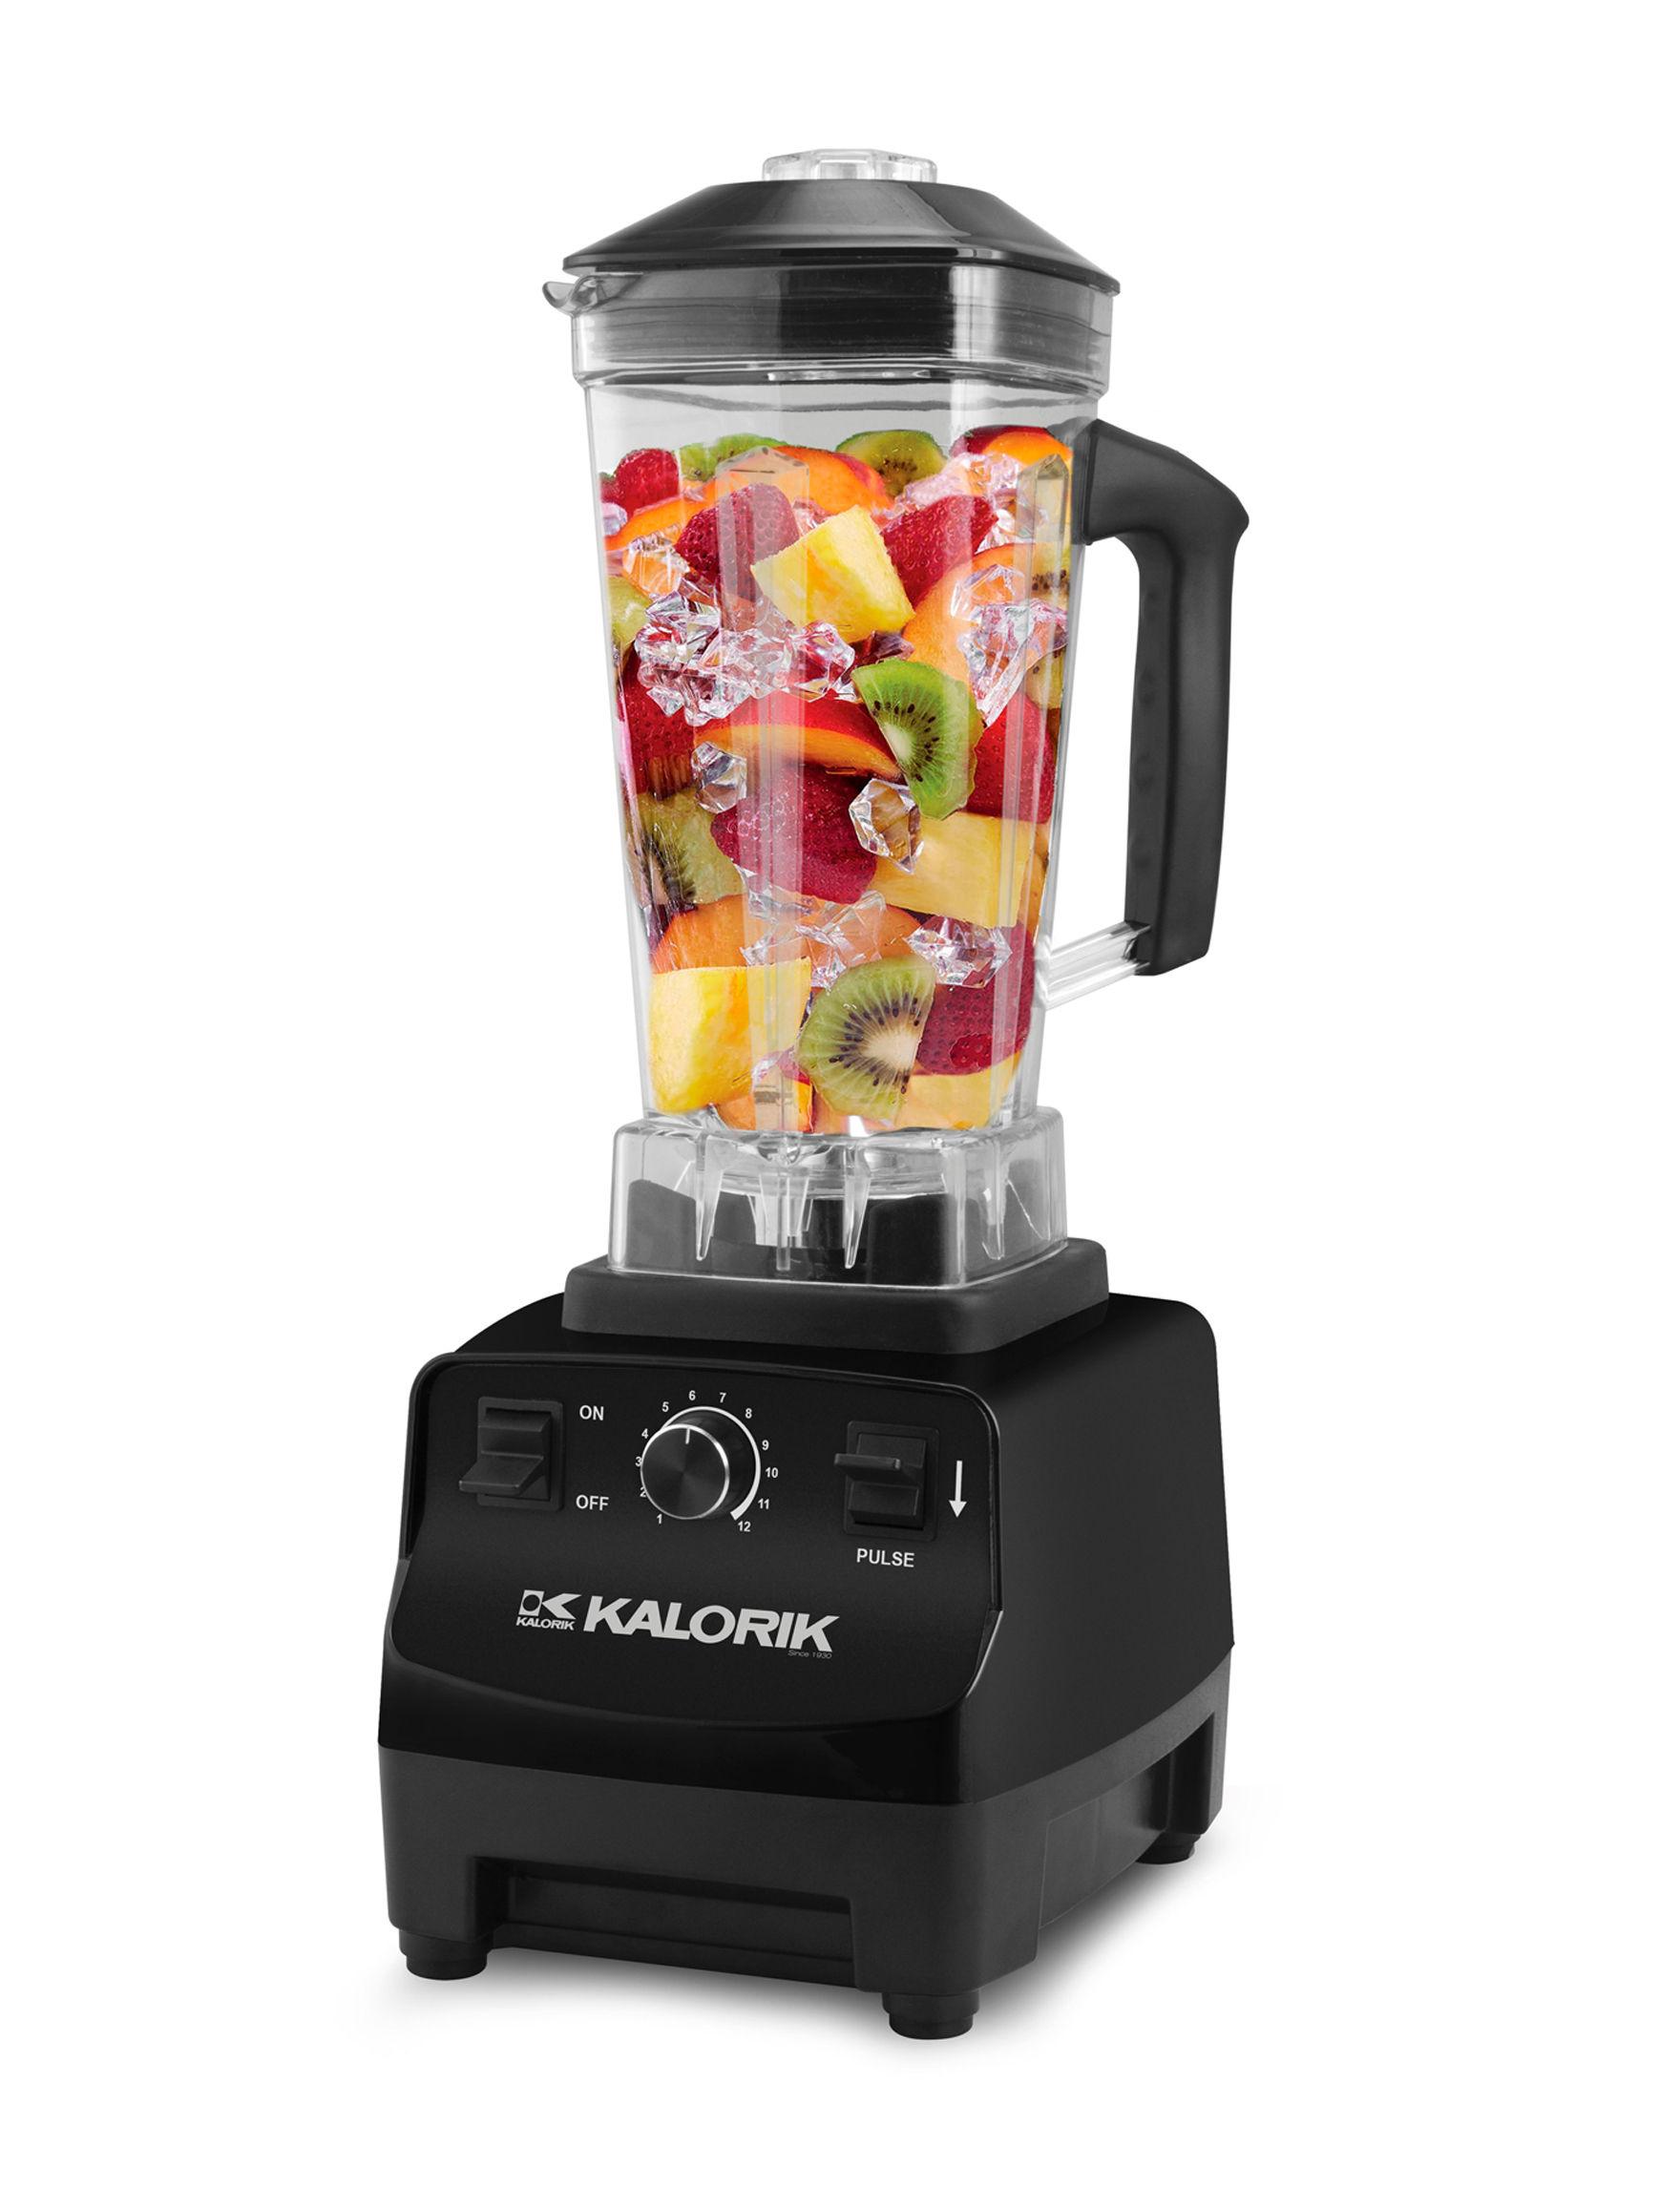 Kalorik Black Blenders & Juicers Kitchen Appliances